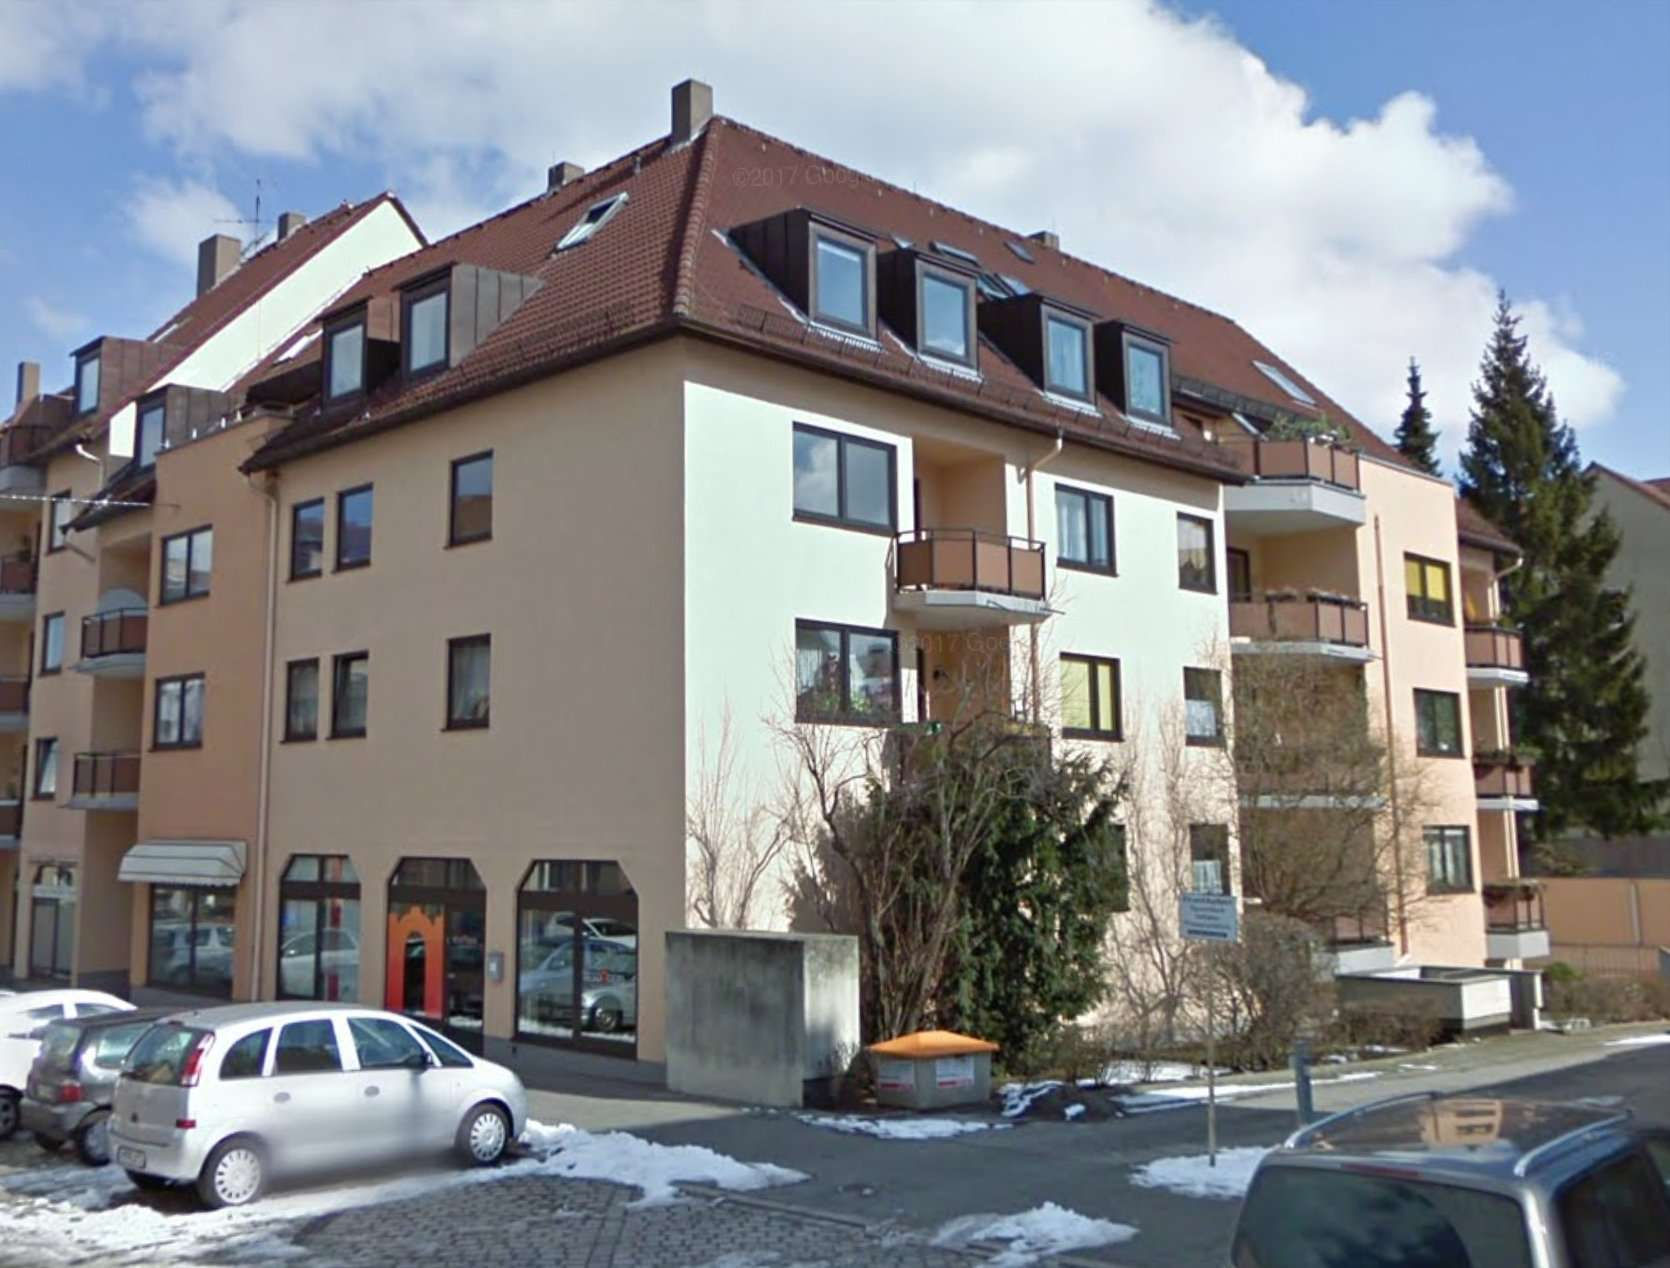 Gepflegte 3-Zimmer-Wohnung mit Balkon in Nürnberg in Uhlandstraße (Nürnberg)